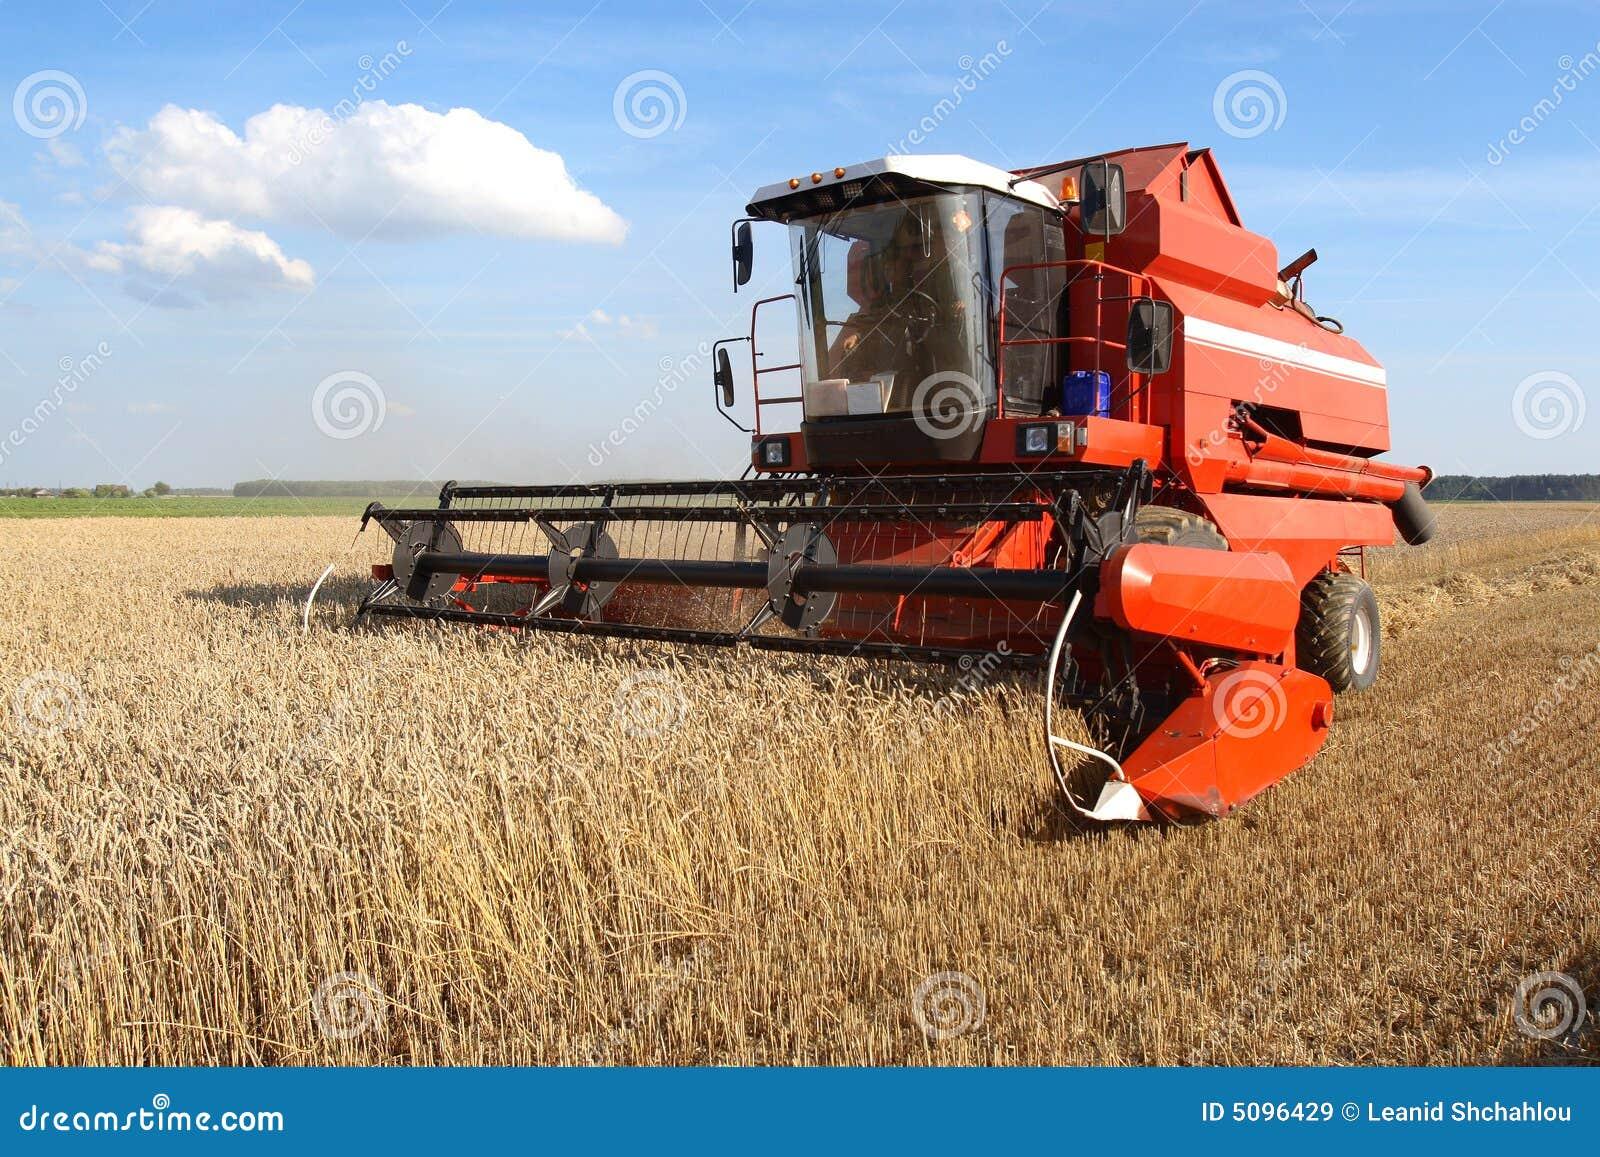 Machine Harvesting Stock Image Image Of Drum Rural